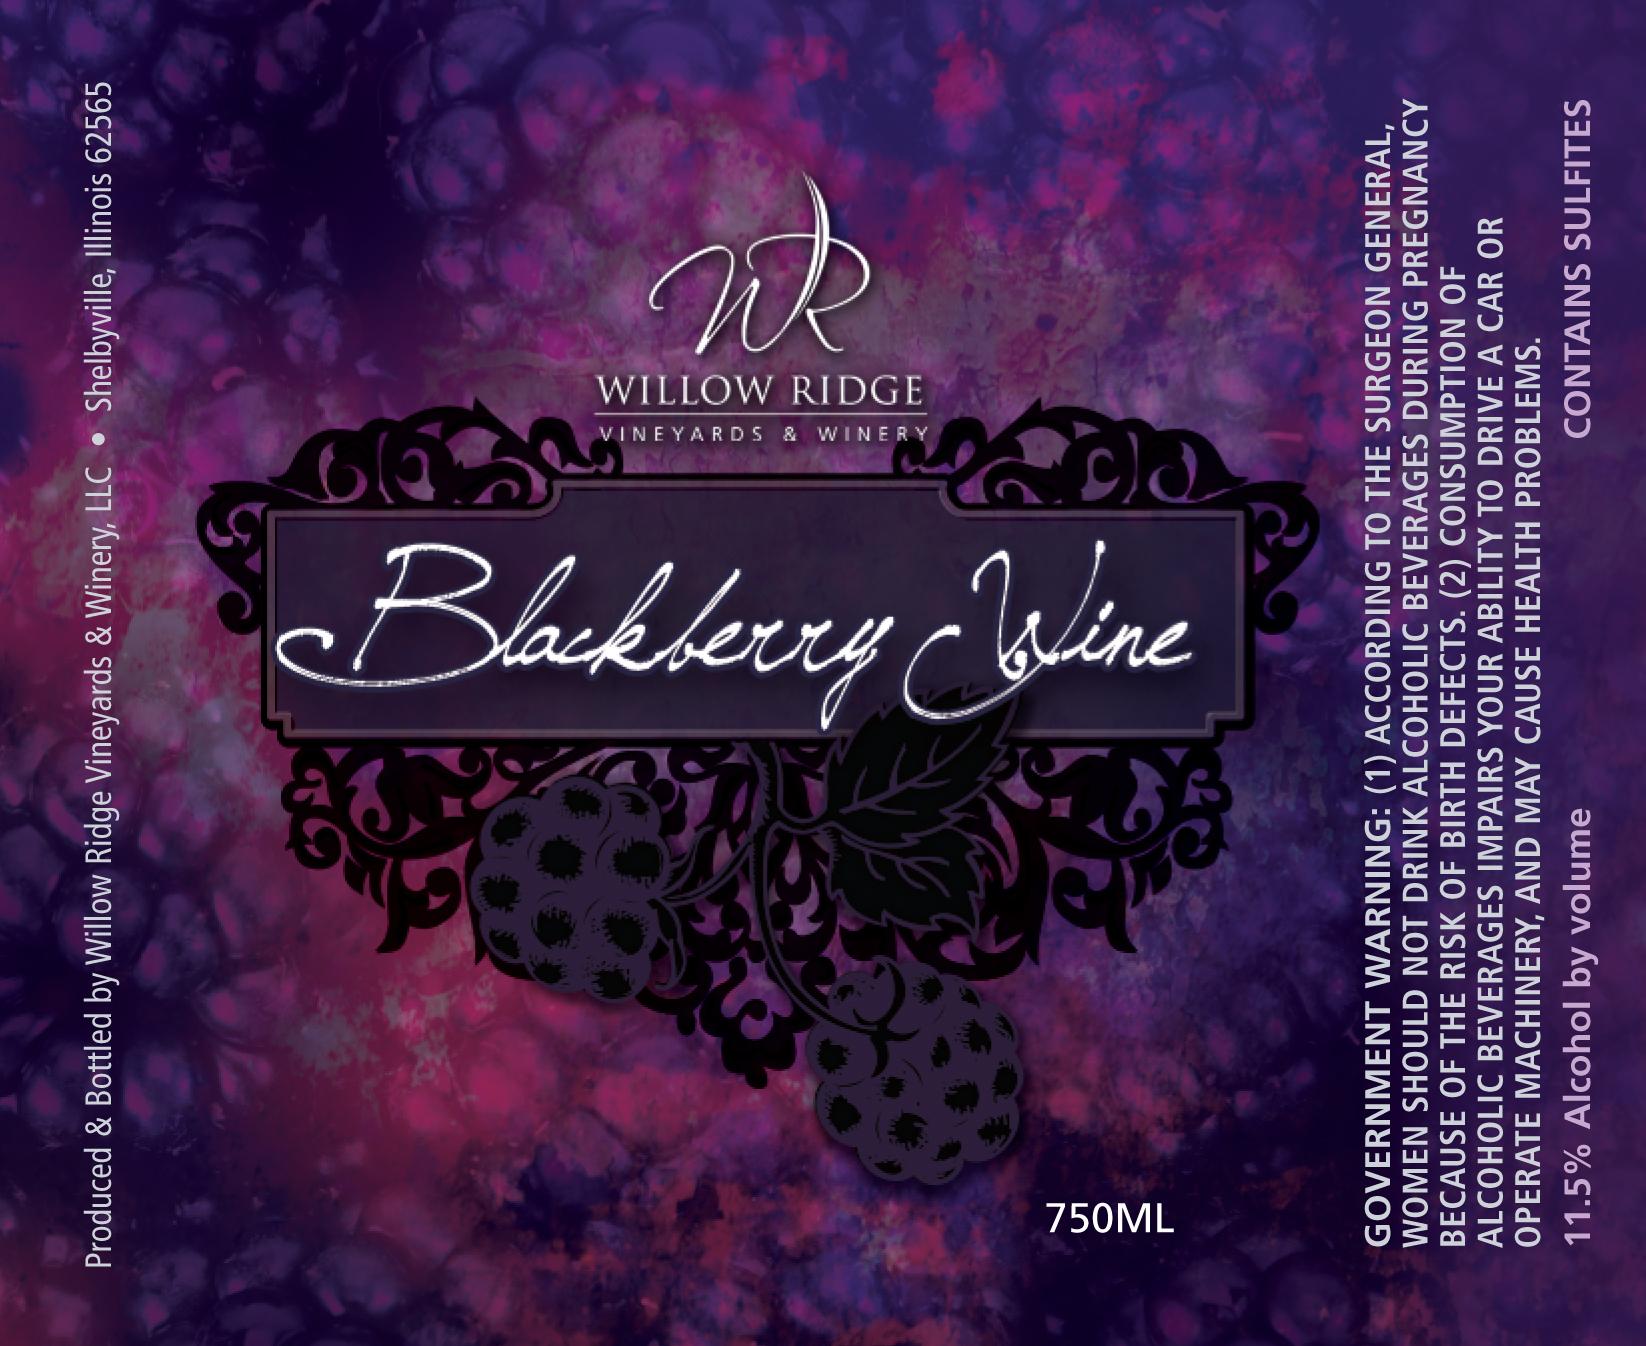 Willow Ridge Winery Blackberry Wine